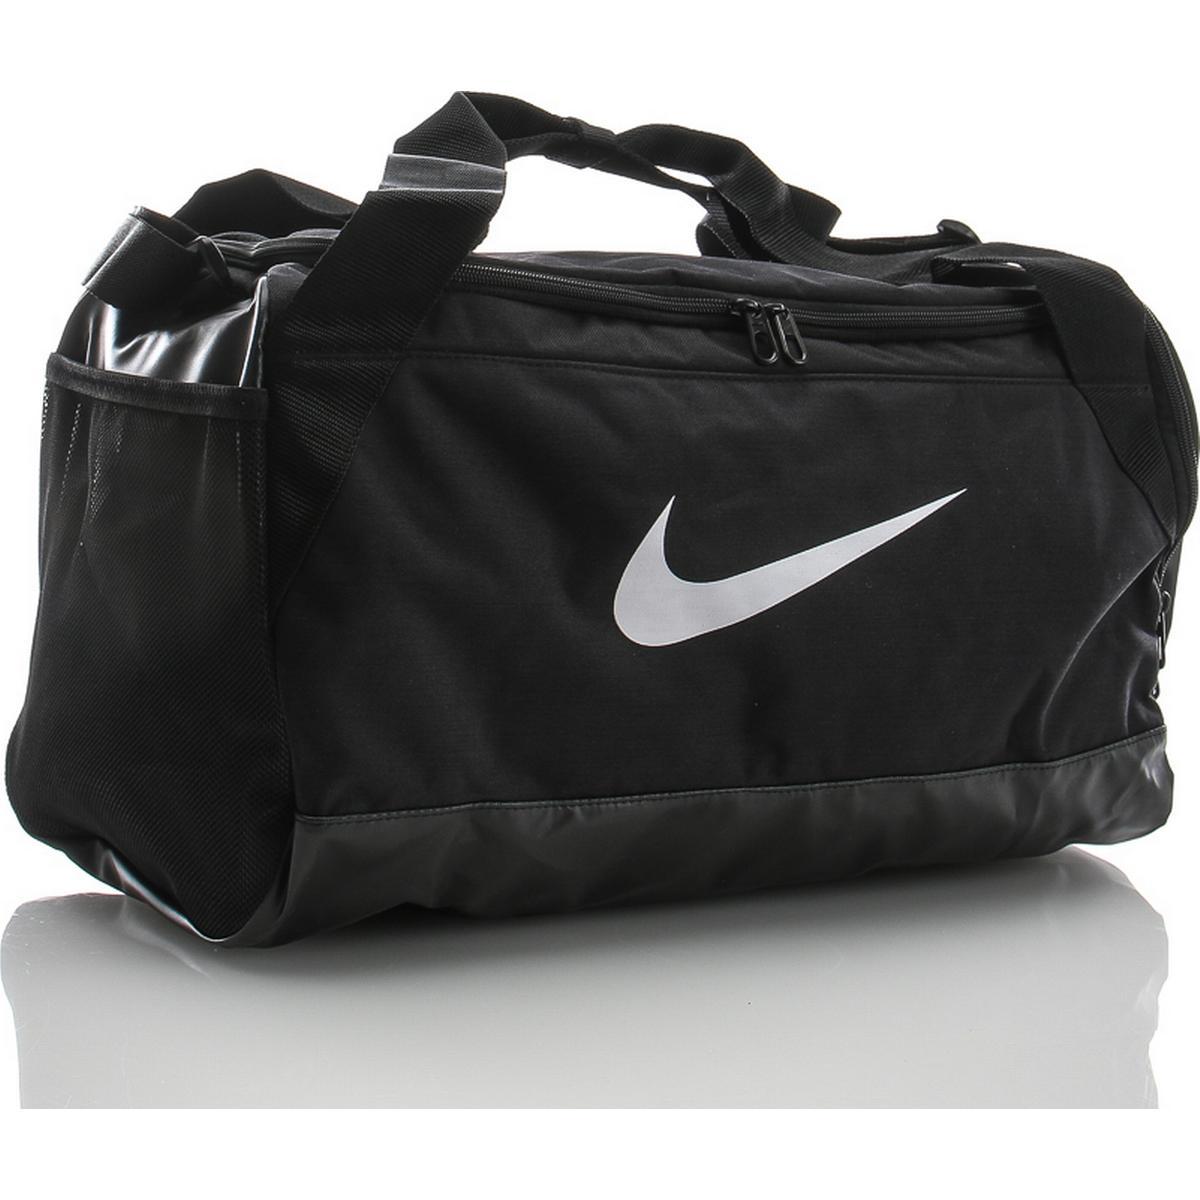 Nike brasilia bag • Hitta det lägsta priset hos PriceRunner nu »